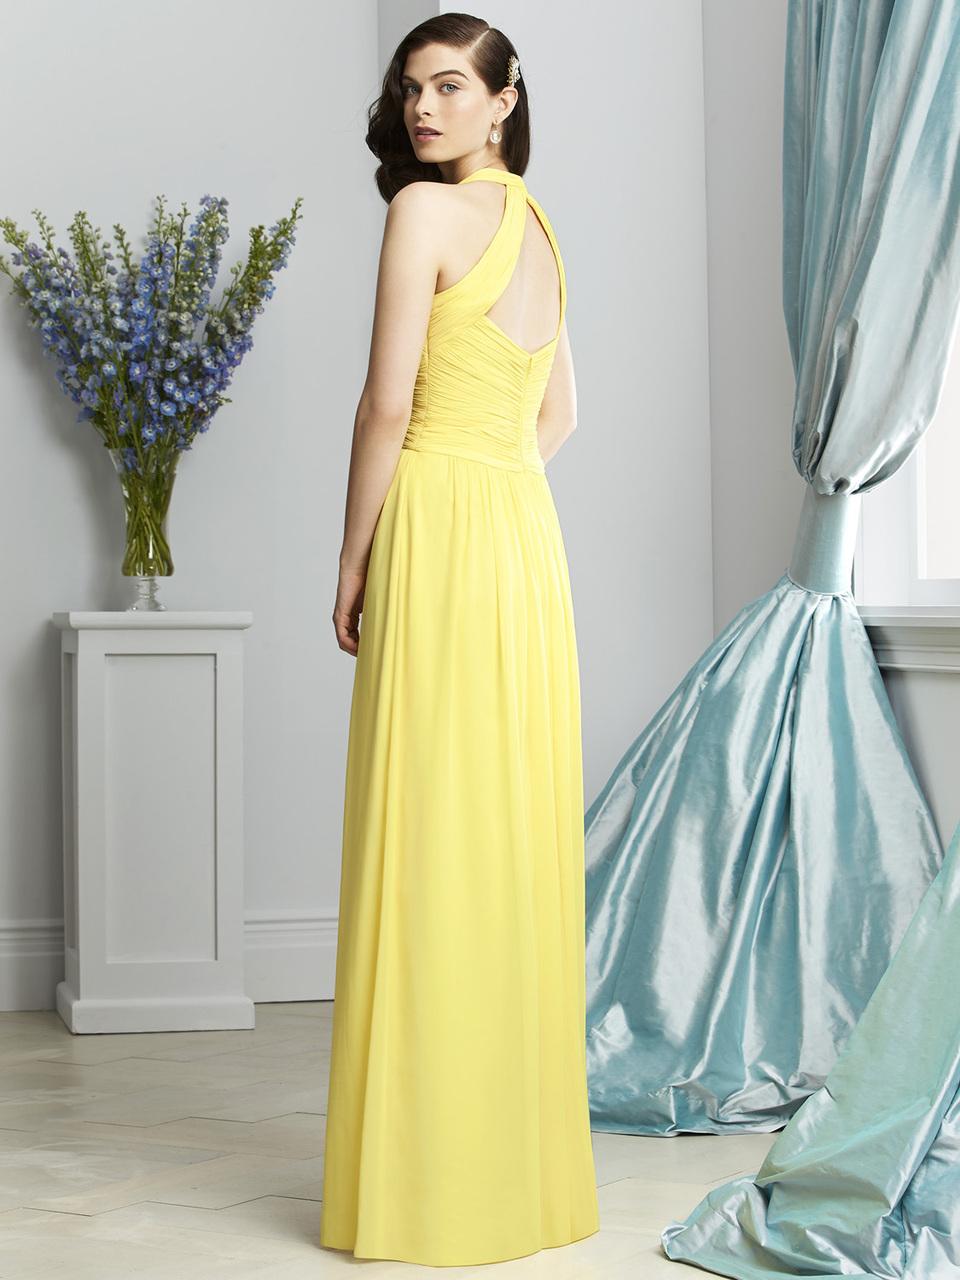 Dessy bridesmaids dresses 2932 by vivian diamond lux chiffon dessy bridesmaids dress style 2932 by vivian diamond lux chiffon ombrellifo Image collections